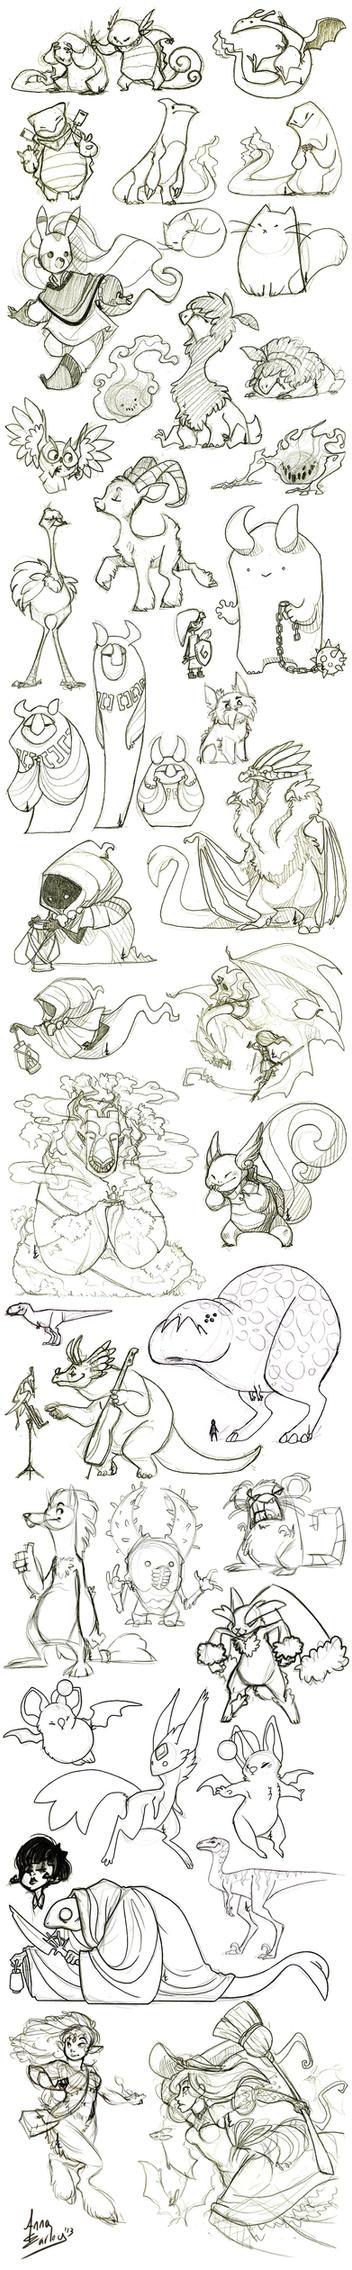 Great Big Sketchdump WInter '13 by Turtle-Arts